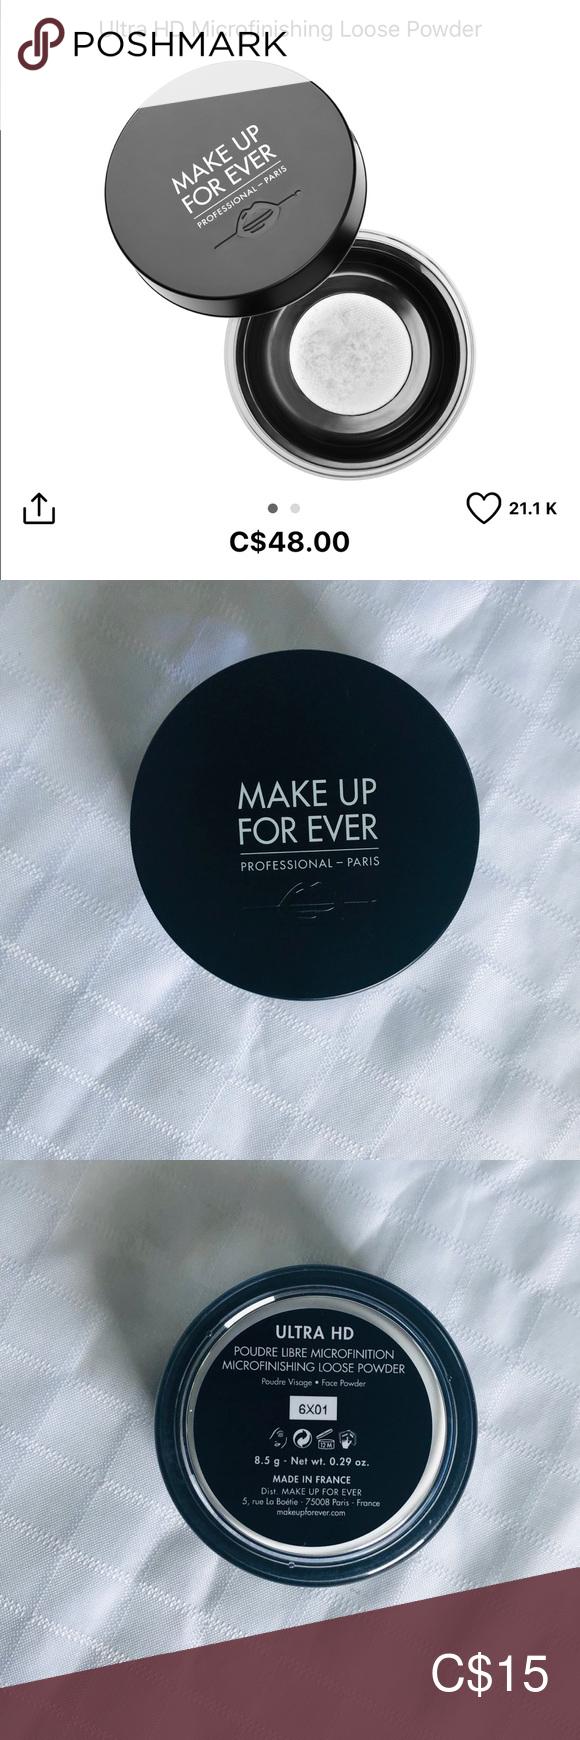 Makeup Forever Ulta HD Microfinishing Loose Powder Loose